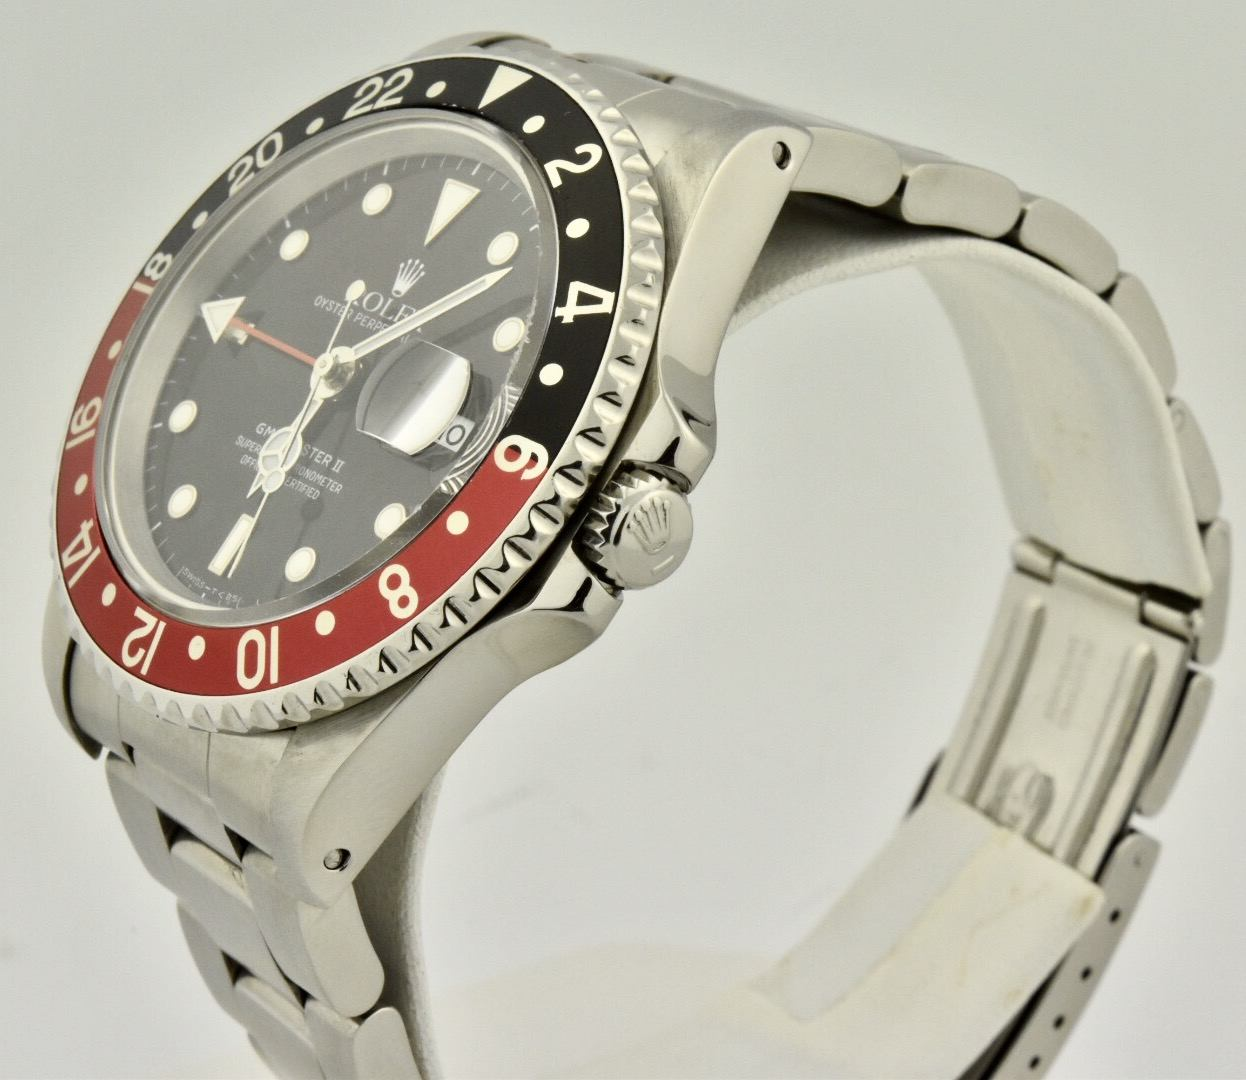 FullSizeRender 2 - Rolex GMT-Master II